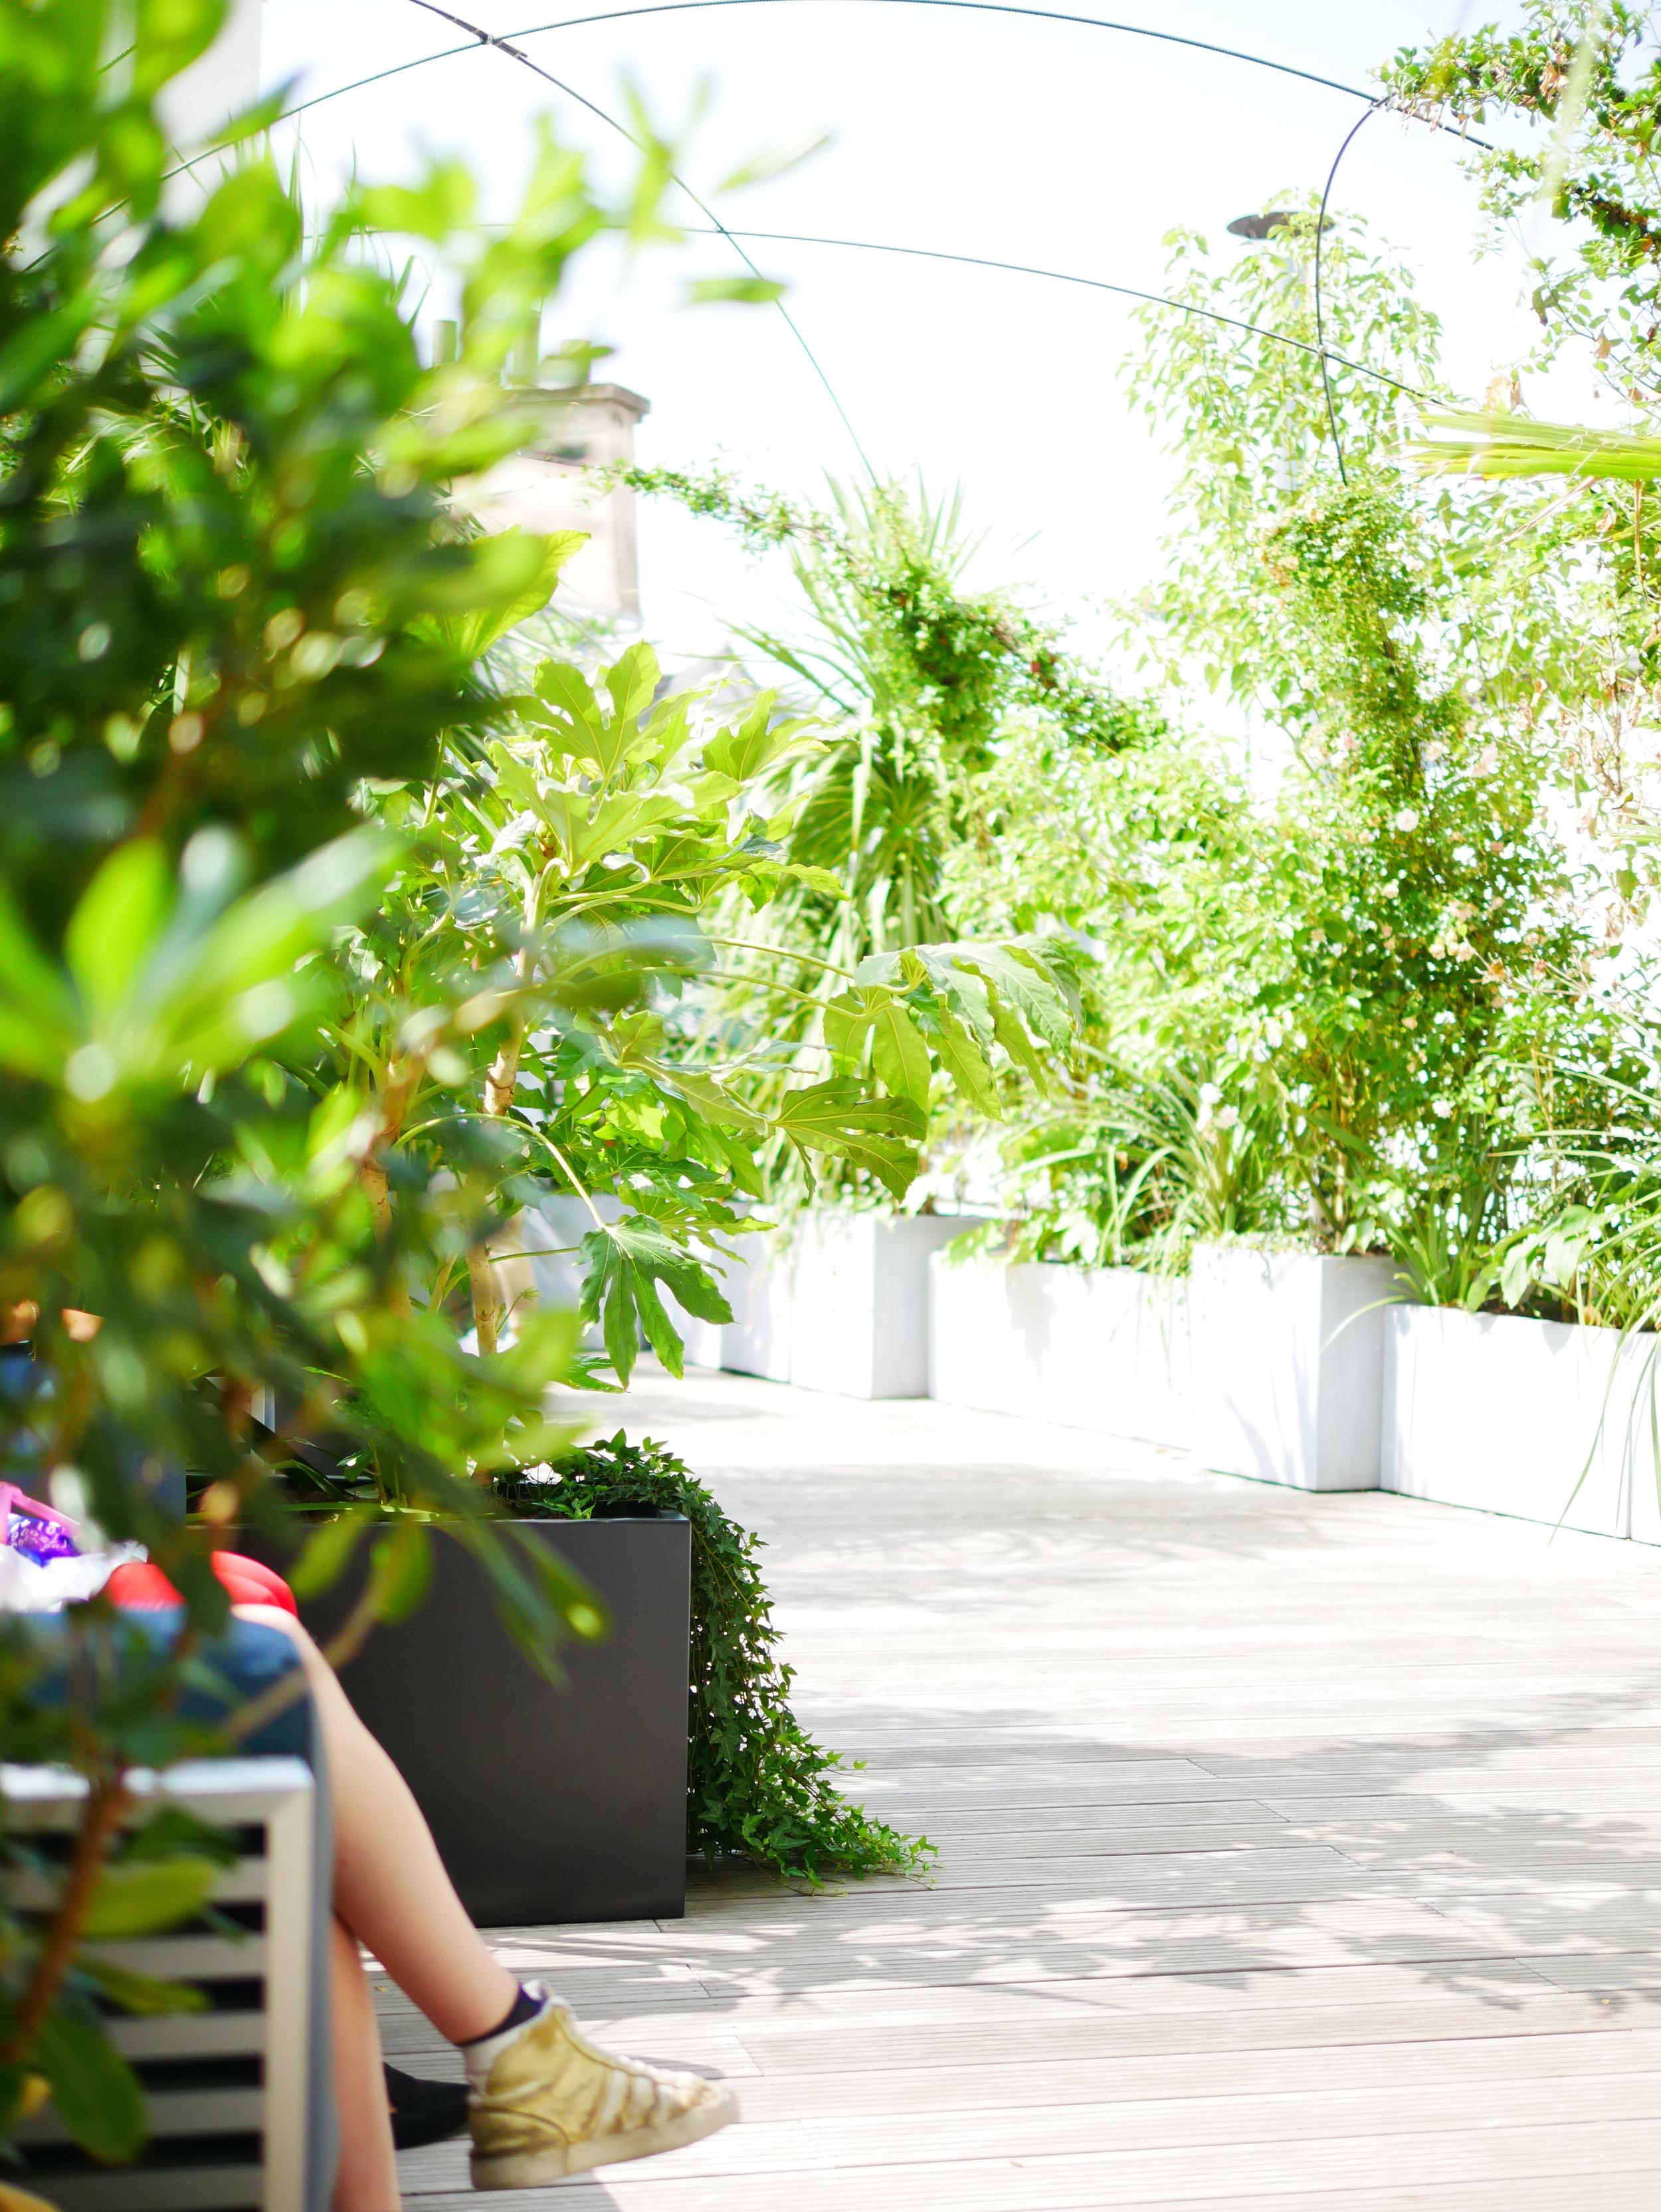 kwerk_haussmann_coworking_paris_terrasses_jardins_outdoor_garden_christophe_gautrand_paysagiste_5.jpg